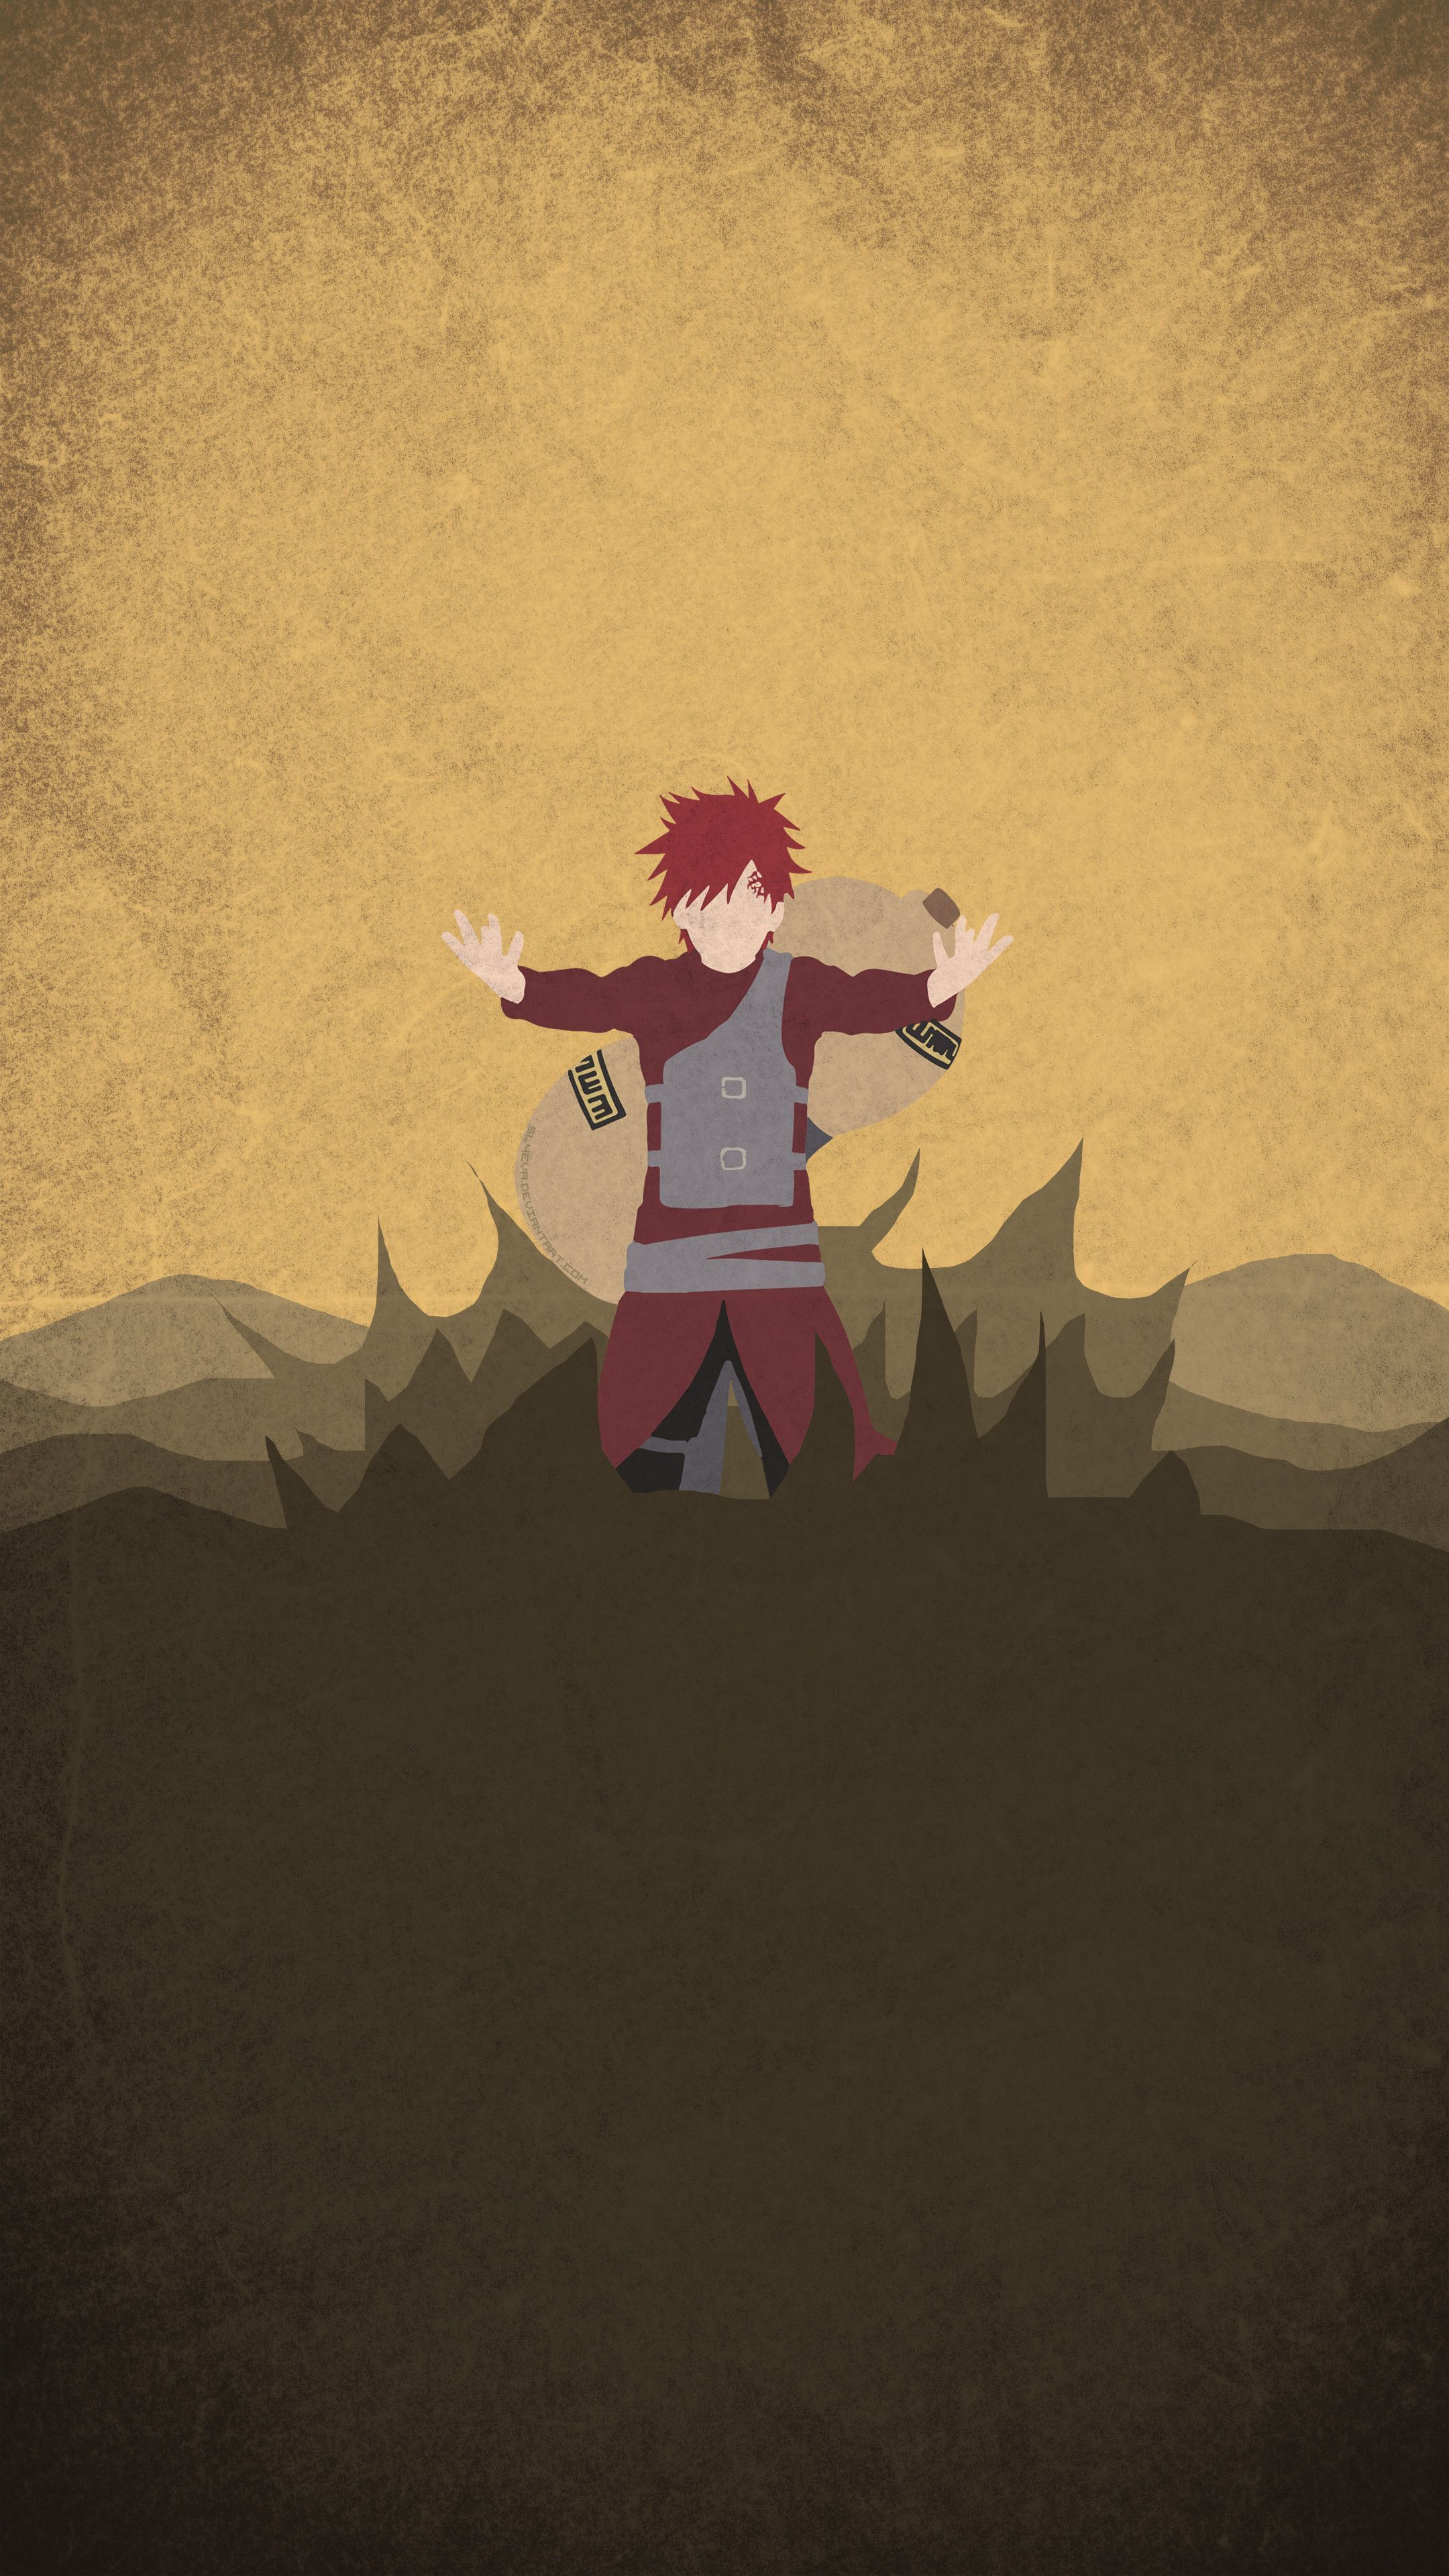 Naruto image by Мєѕѕяѕ Ρα∂fσσт αи∂ Ρяσиgѕ Naruto wallpaper